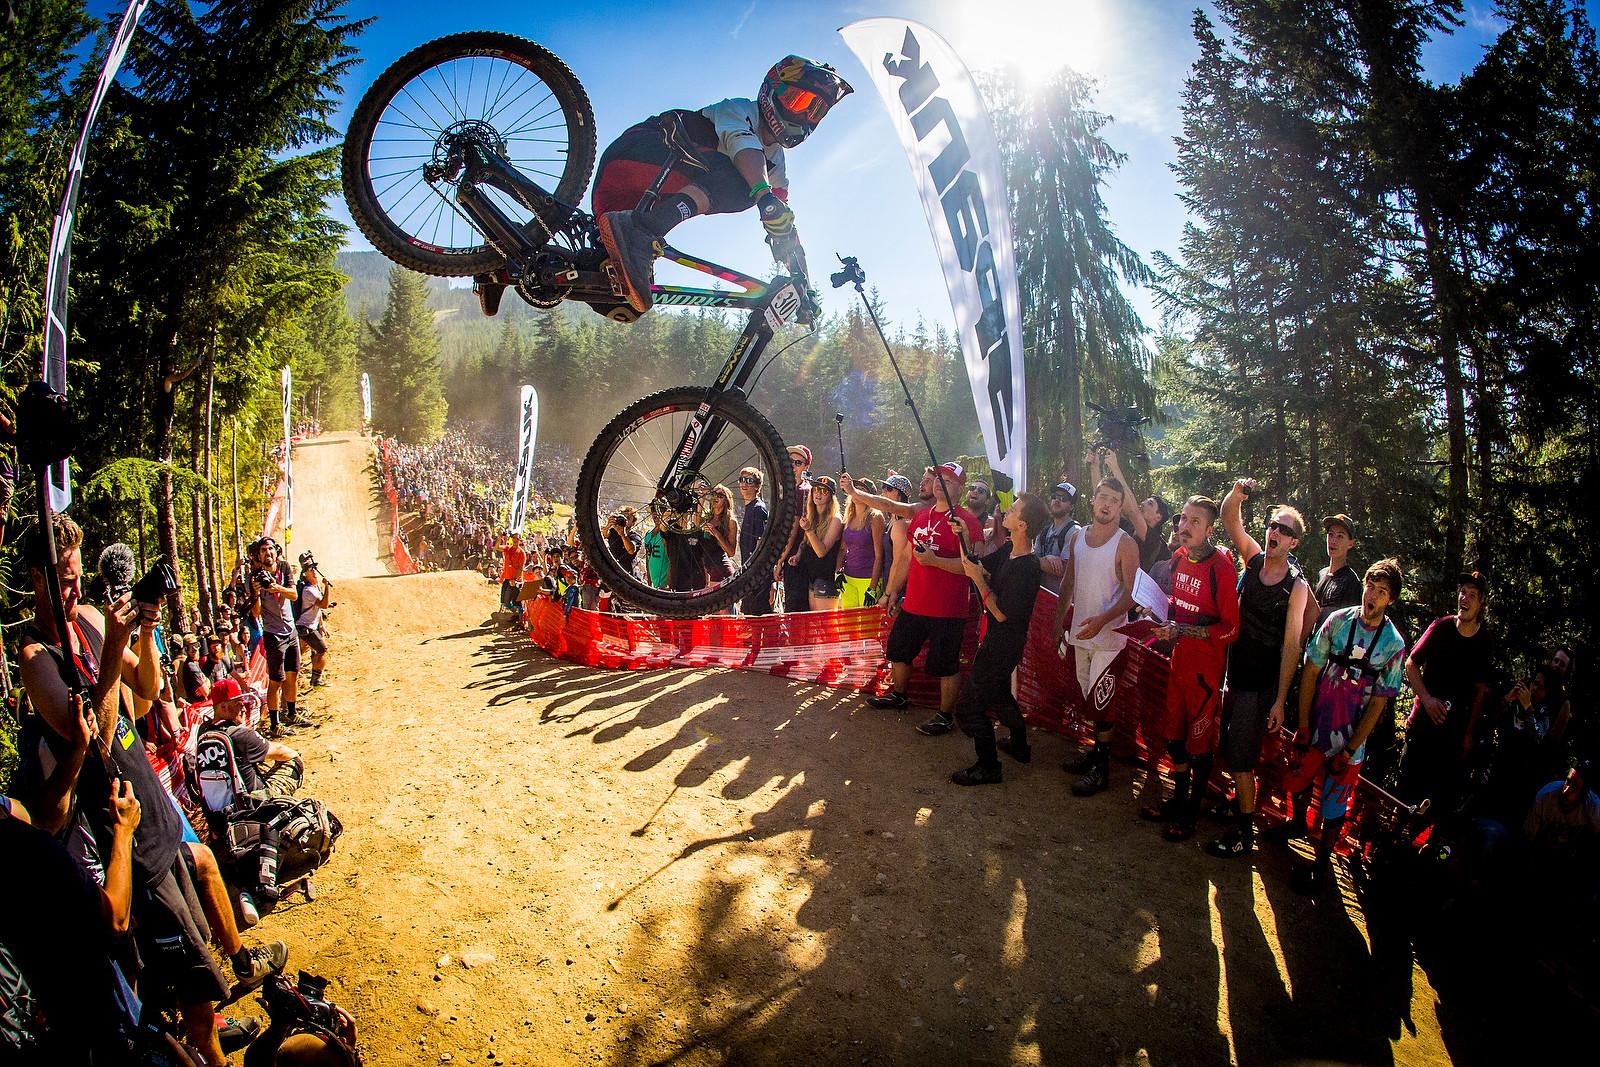 Finn Iles - Whip Off World Champs Photo Blast - Mountain Biking Pictures - Vital MTB